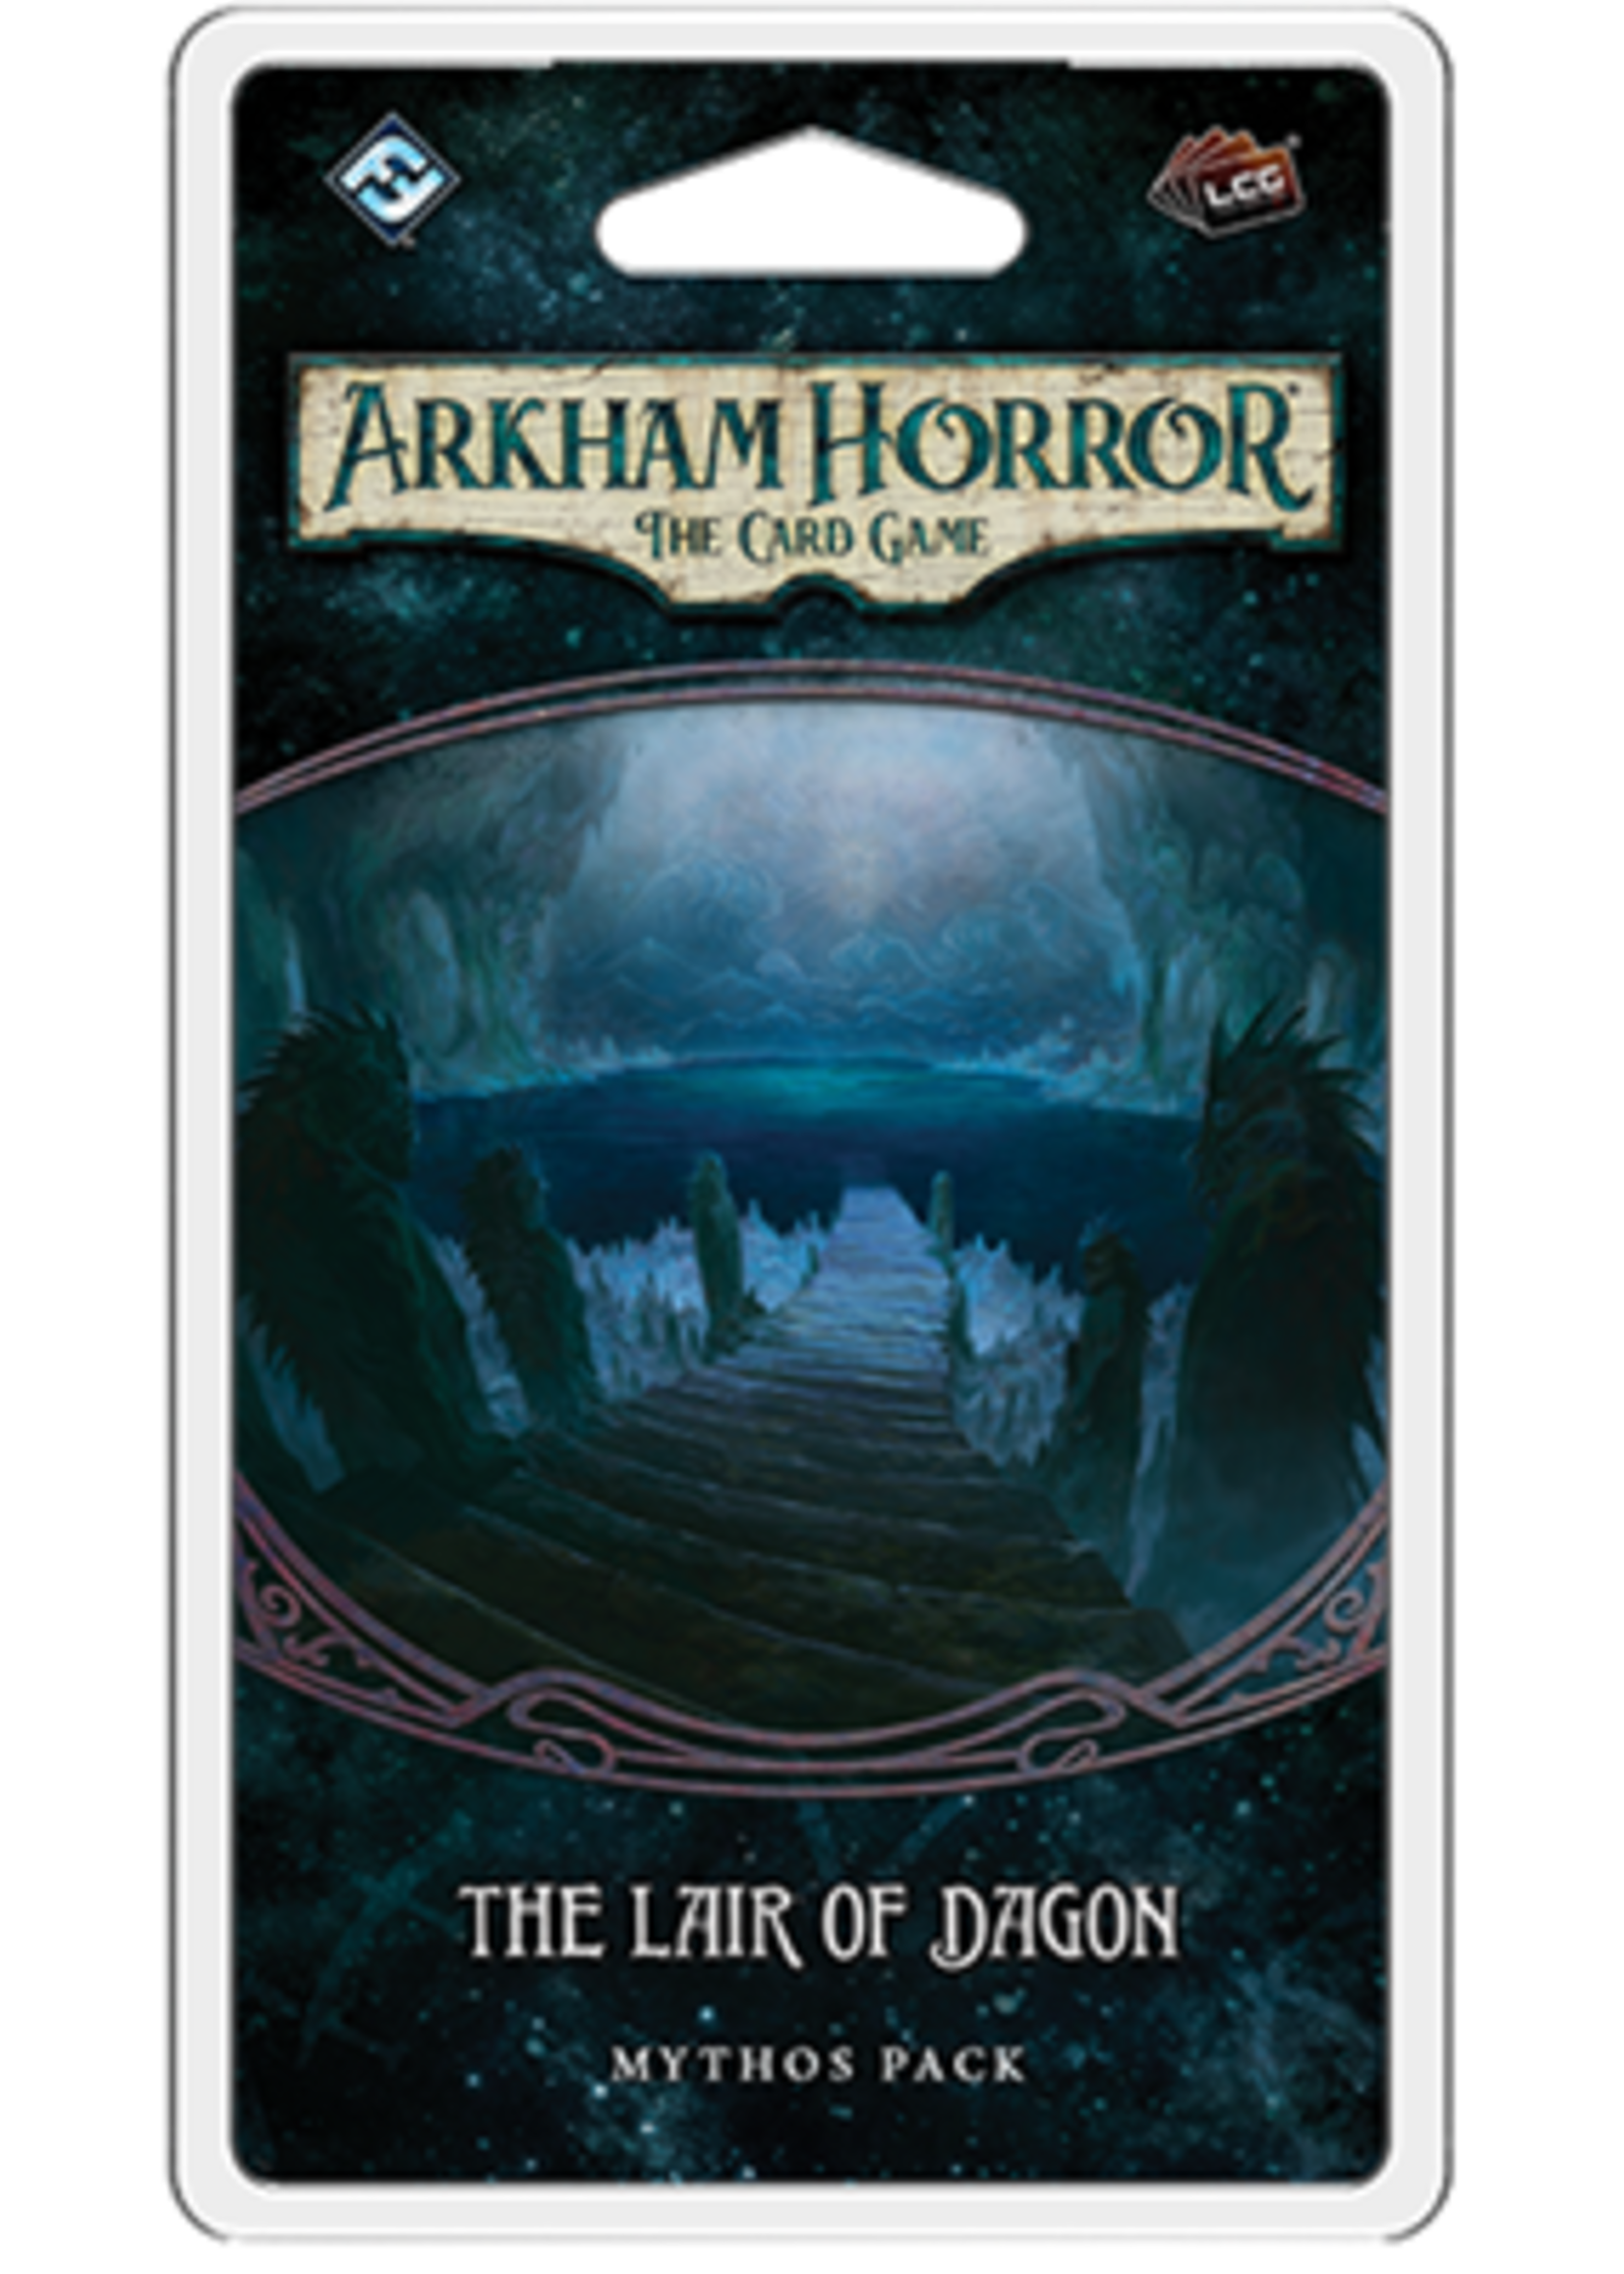 Arkham Horror LCG The Lair of Dagon